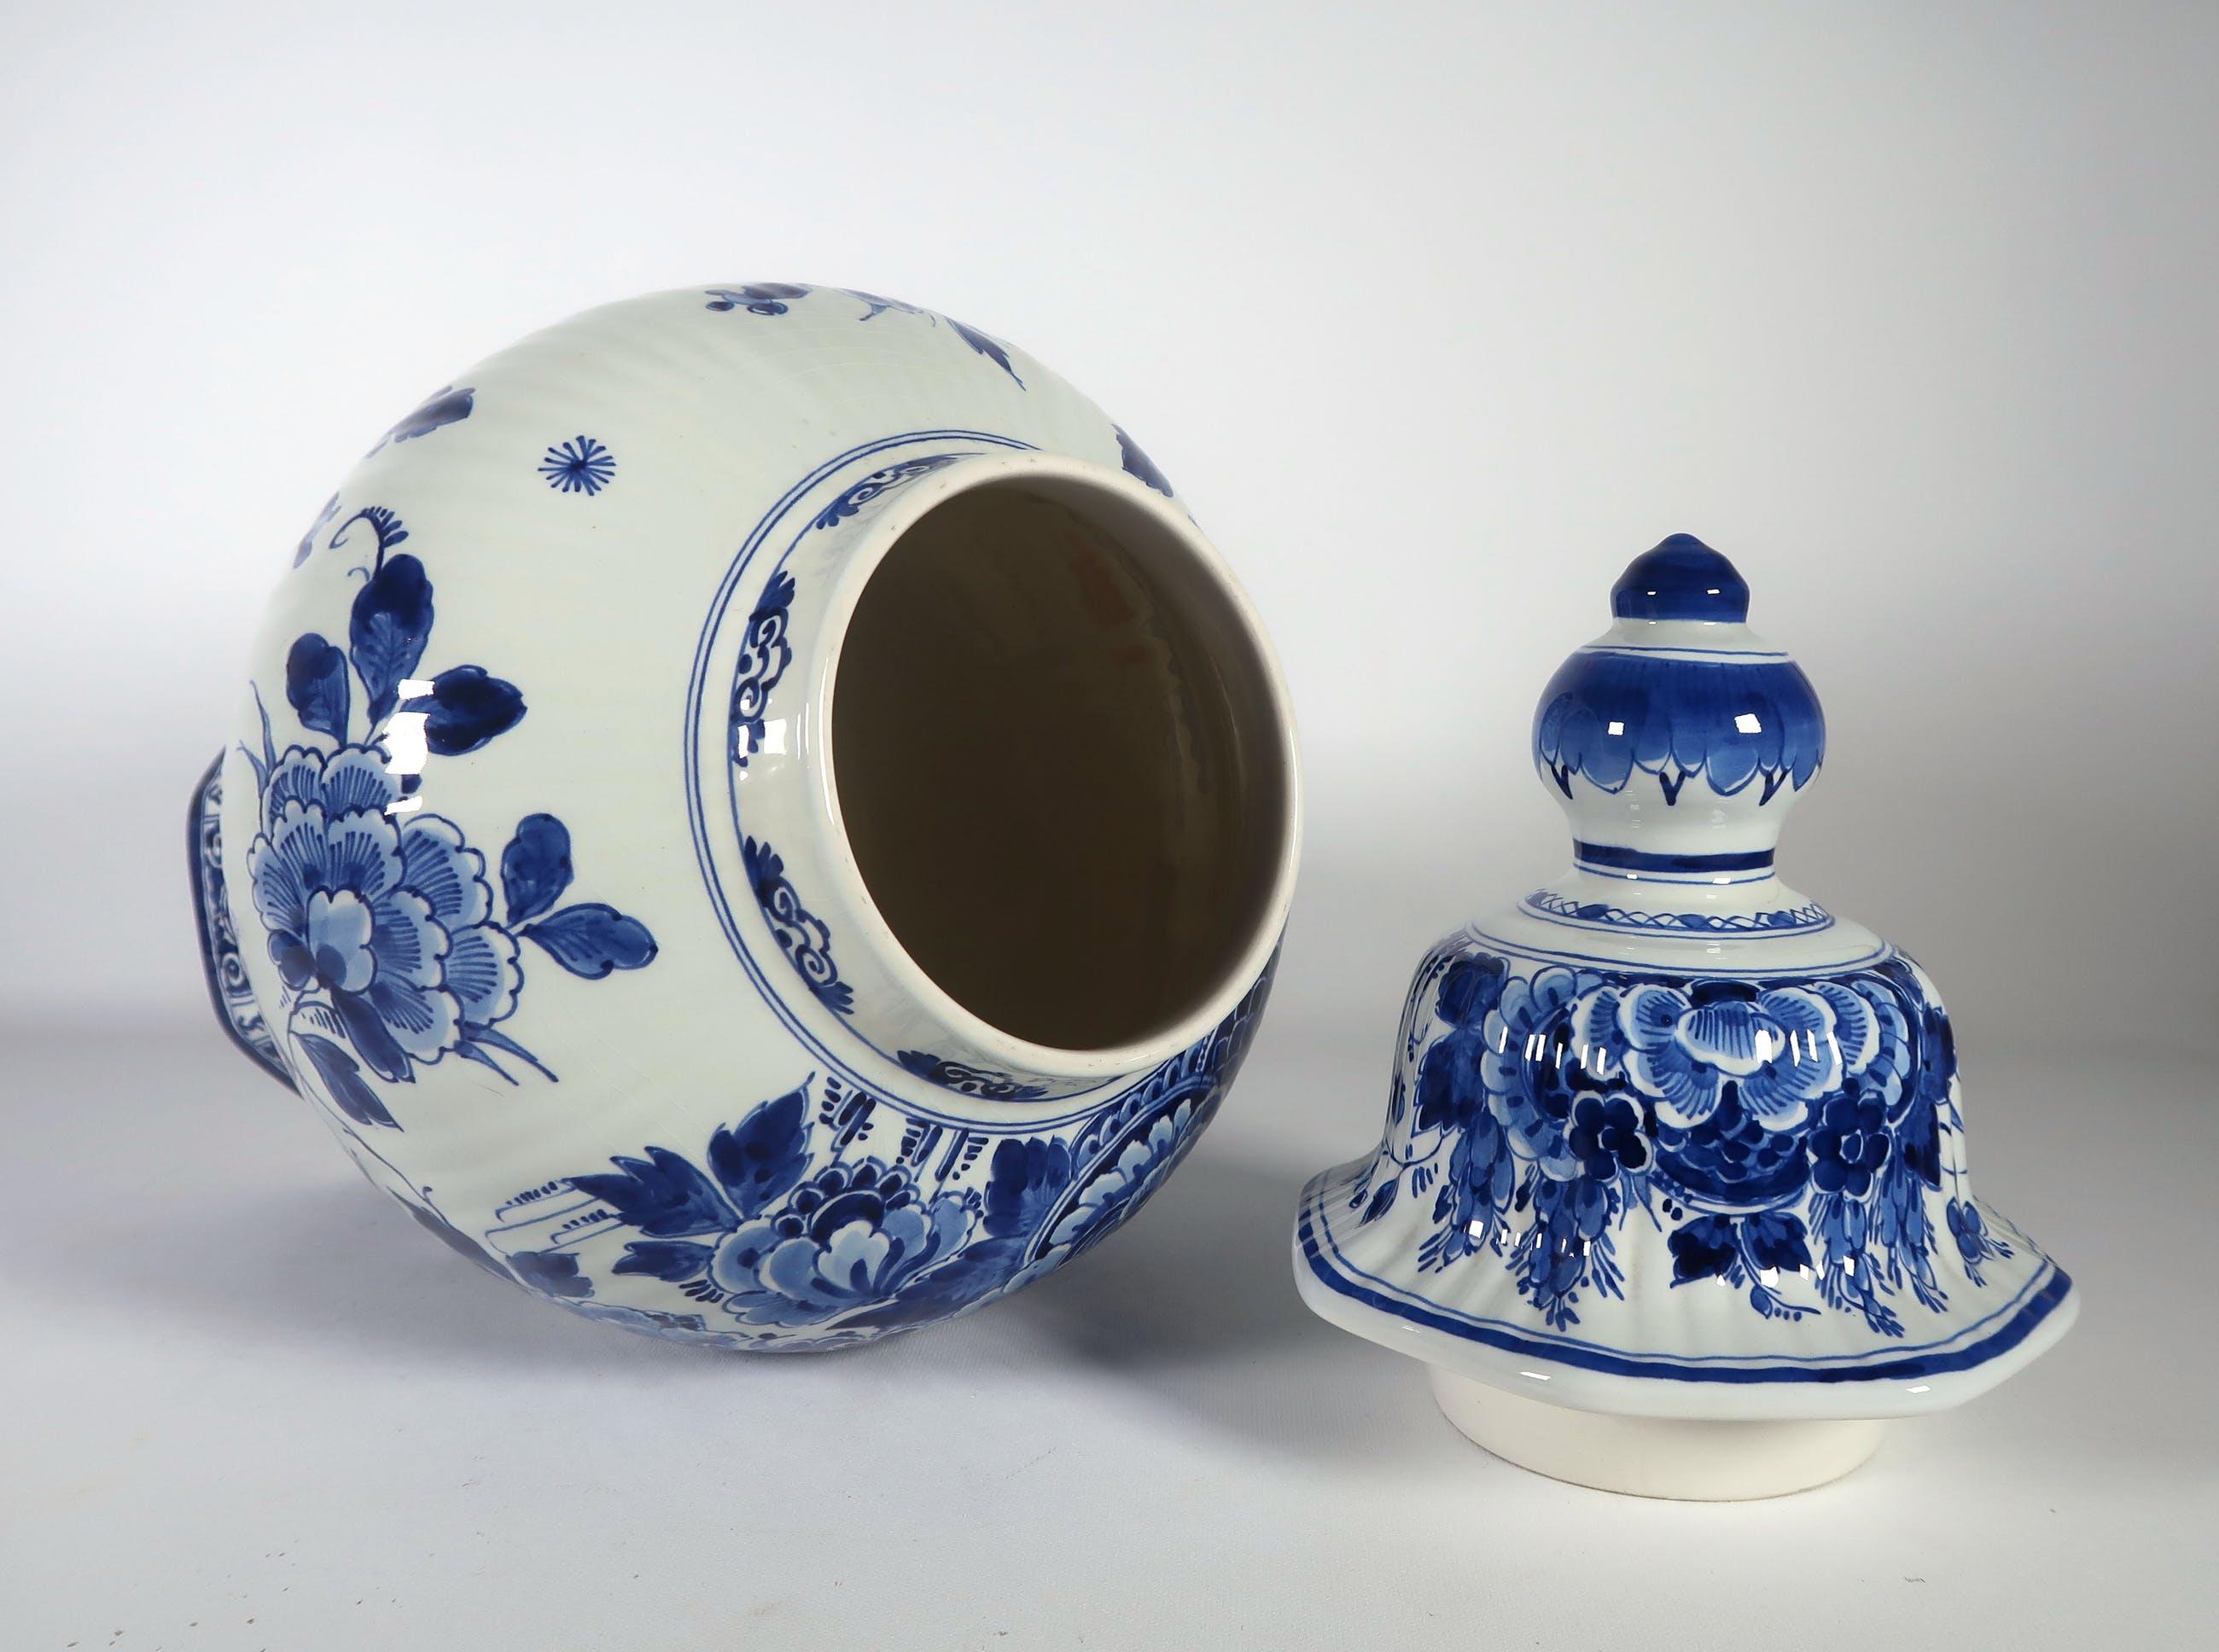 Super Porceleyne Fles (Royal Delft) - Aardewerk, Dekselvaas verkocht QZ-49